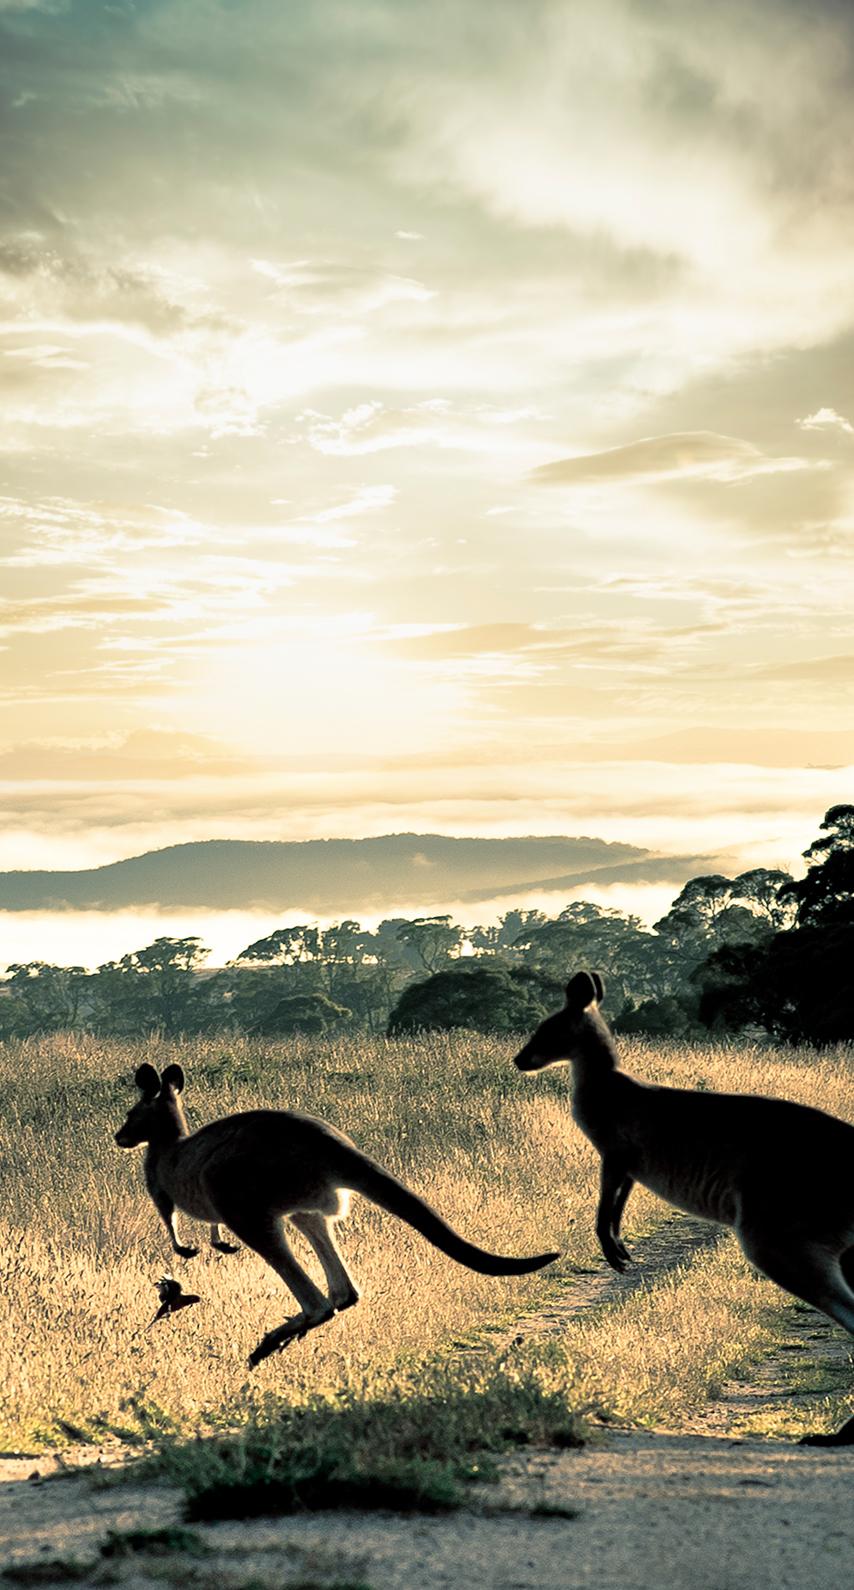 savanna, side view